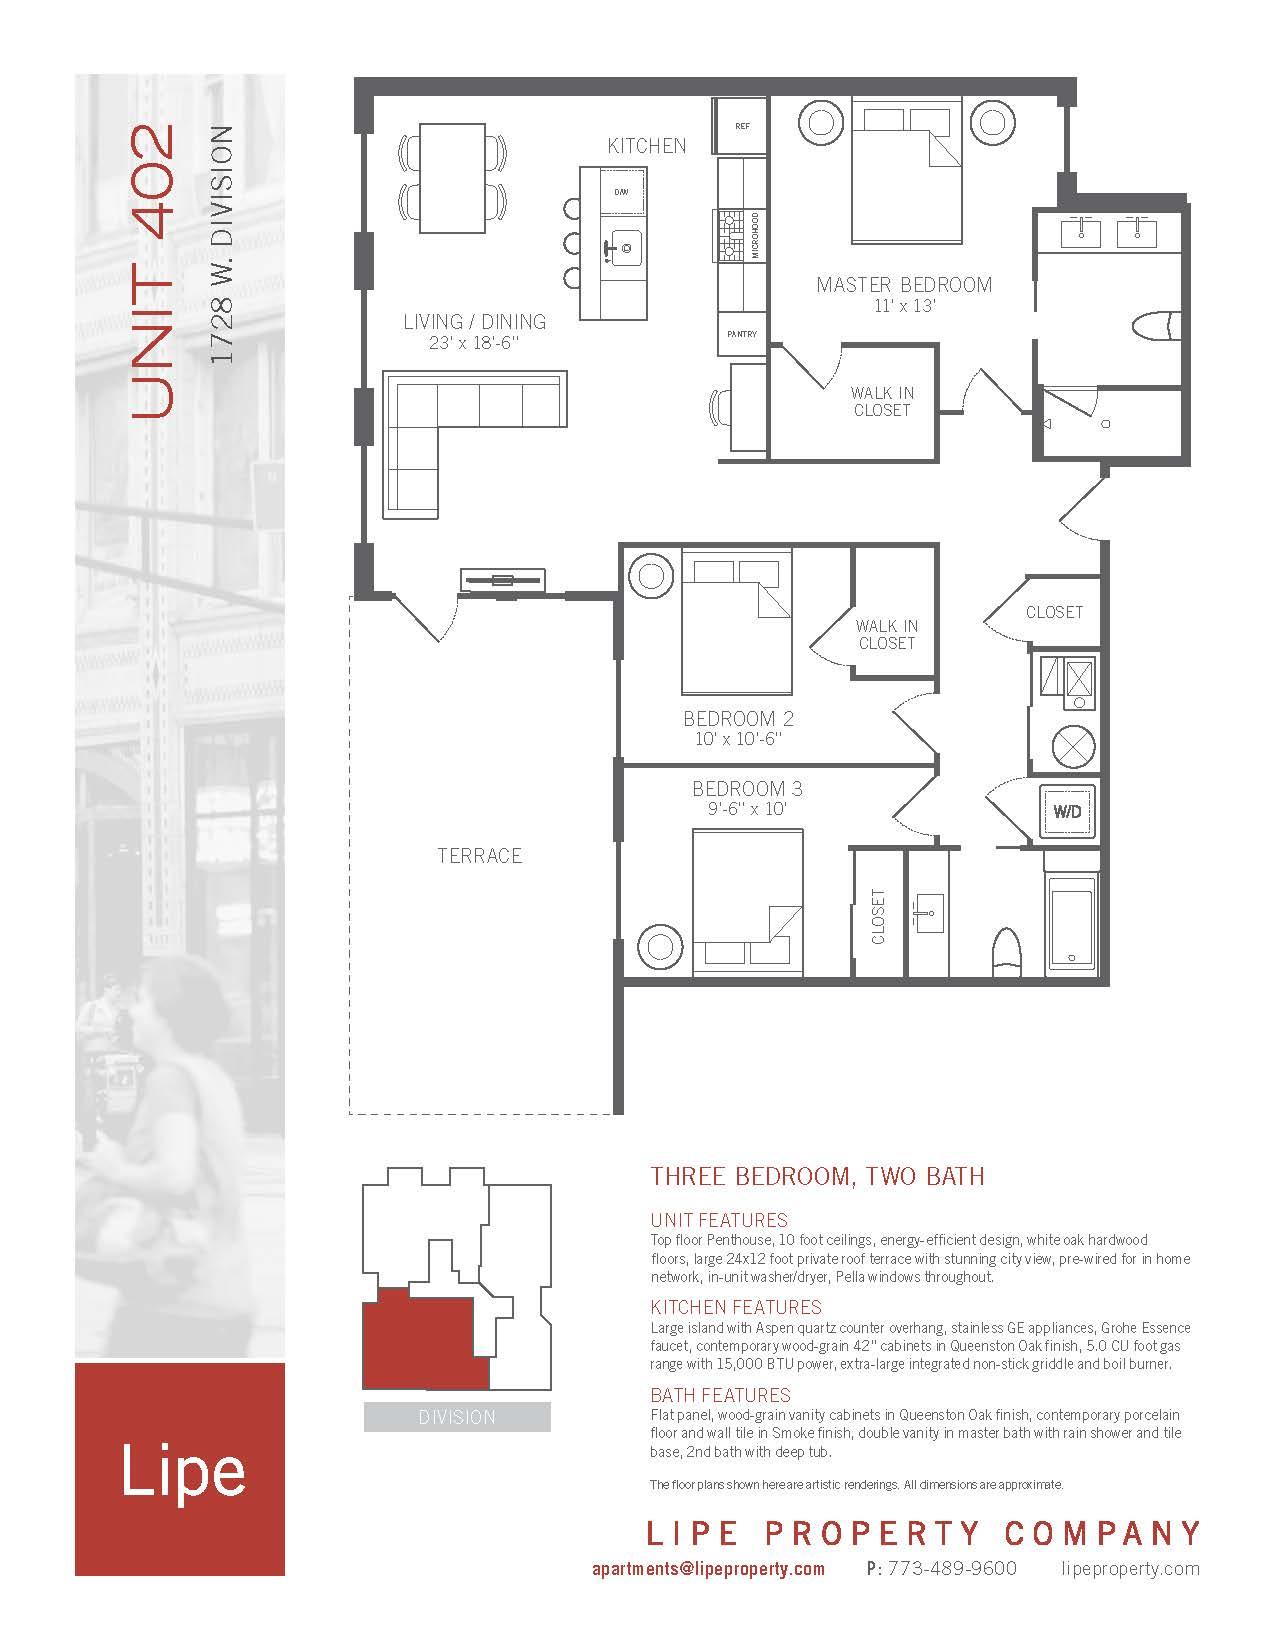 1728-West-Division-402-Floorplan-Chicago-apartment-for-rent.jpg